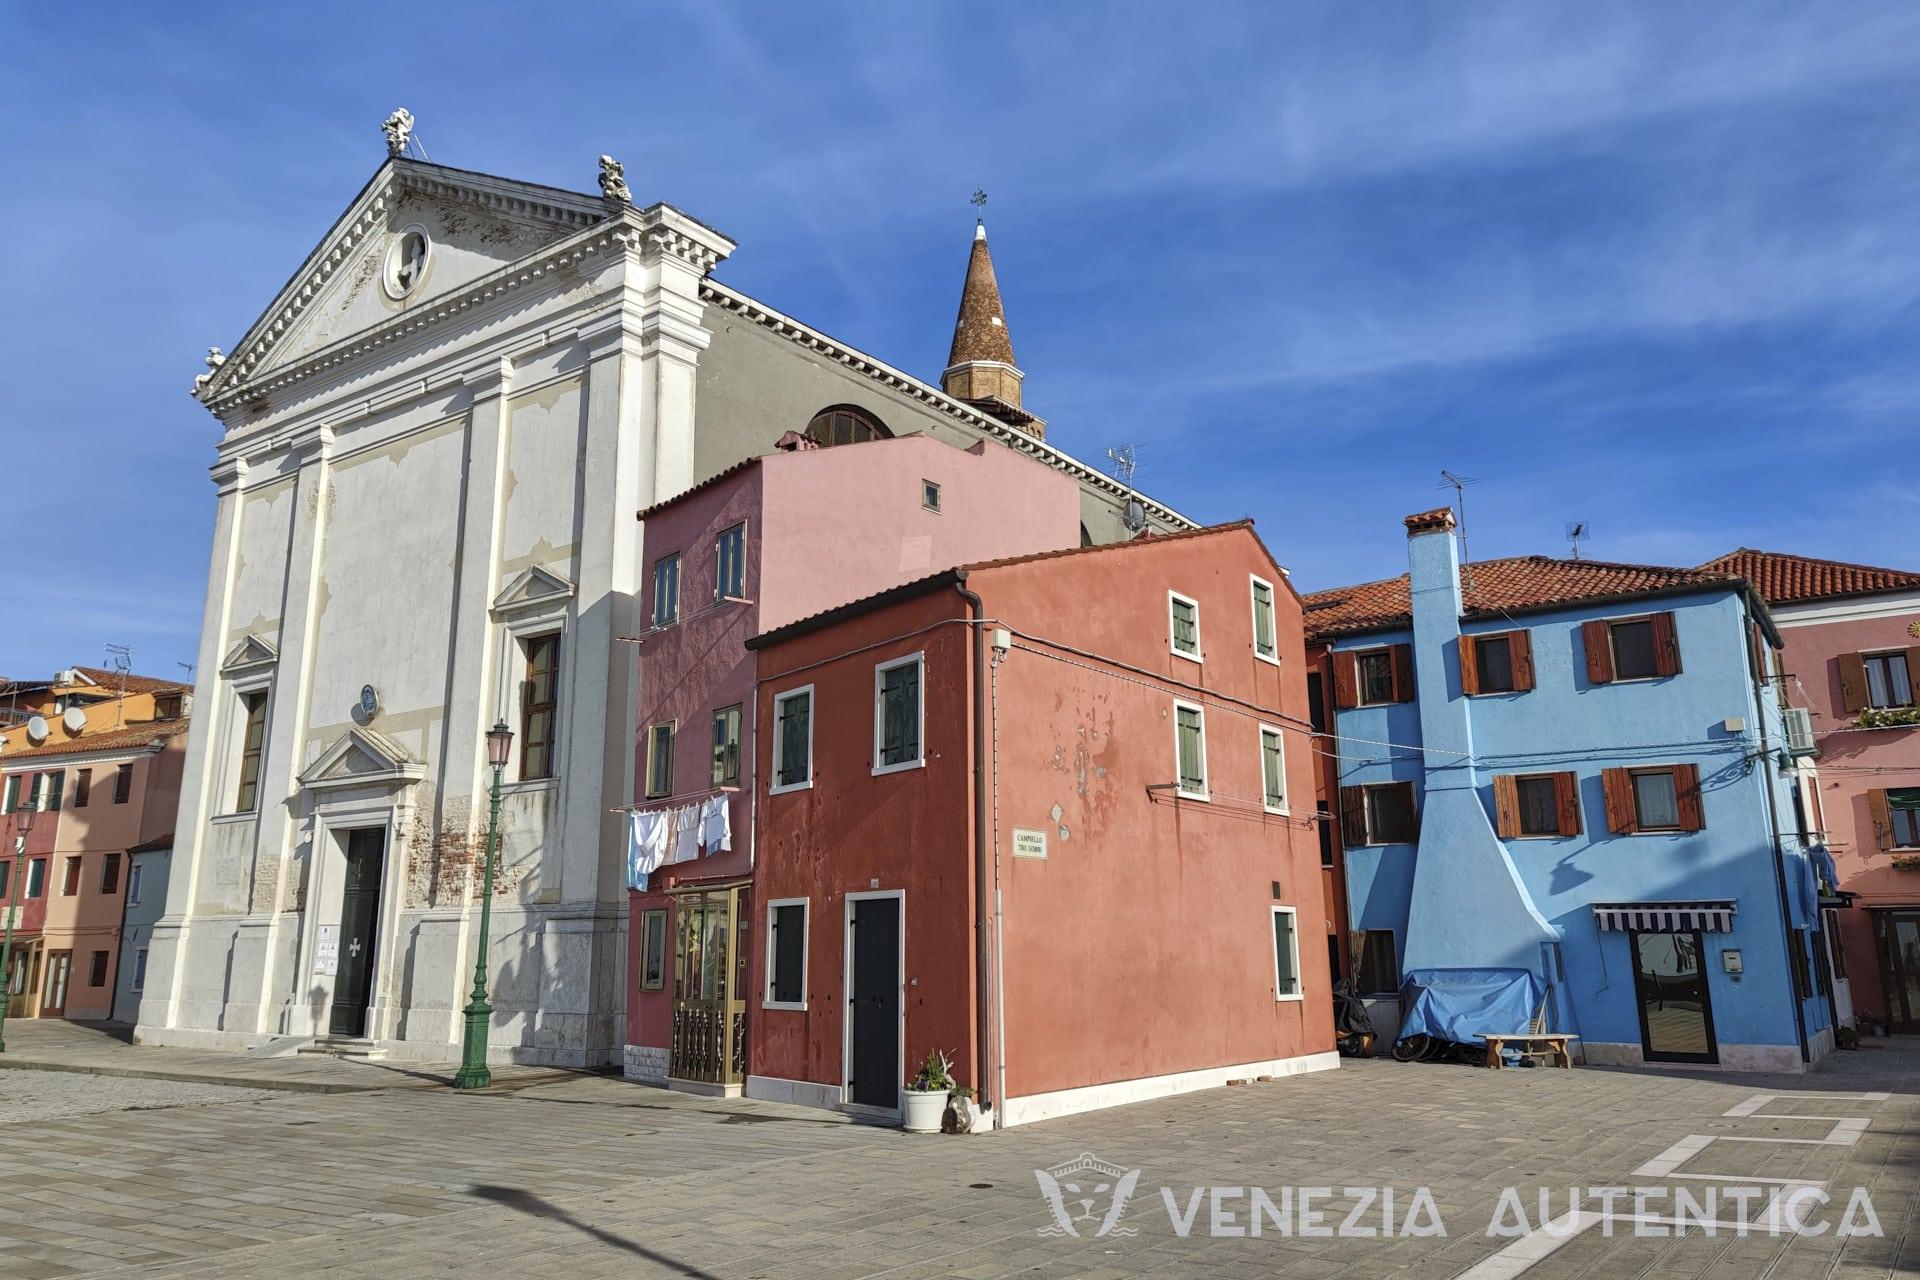 Lido, Pellestrina, and Chioggia: 3 pearls you can not miss - Venetian island - Venezia Autentica | Discover and Support the Authentic Venice -